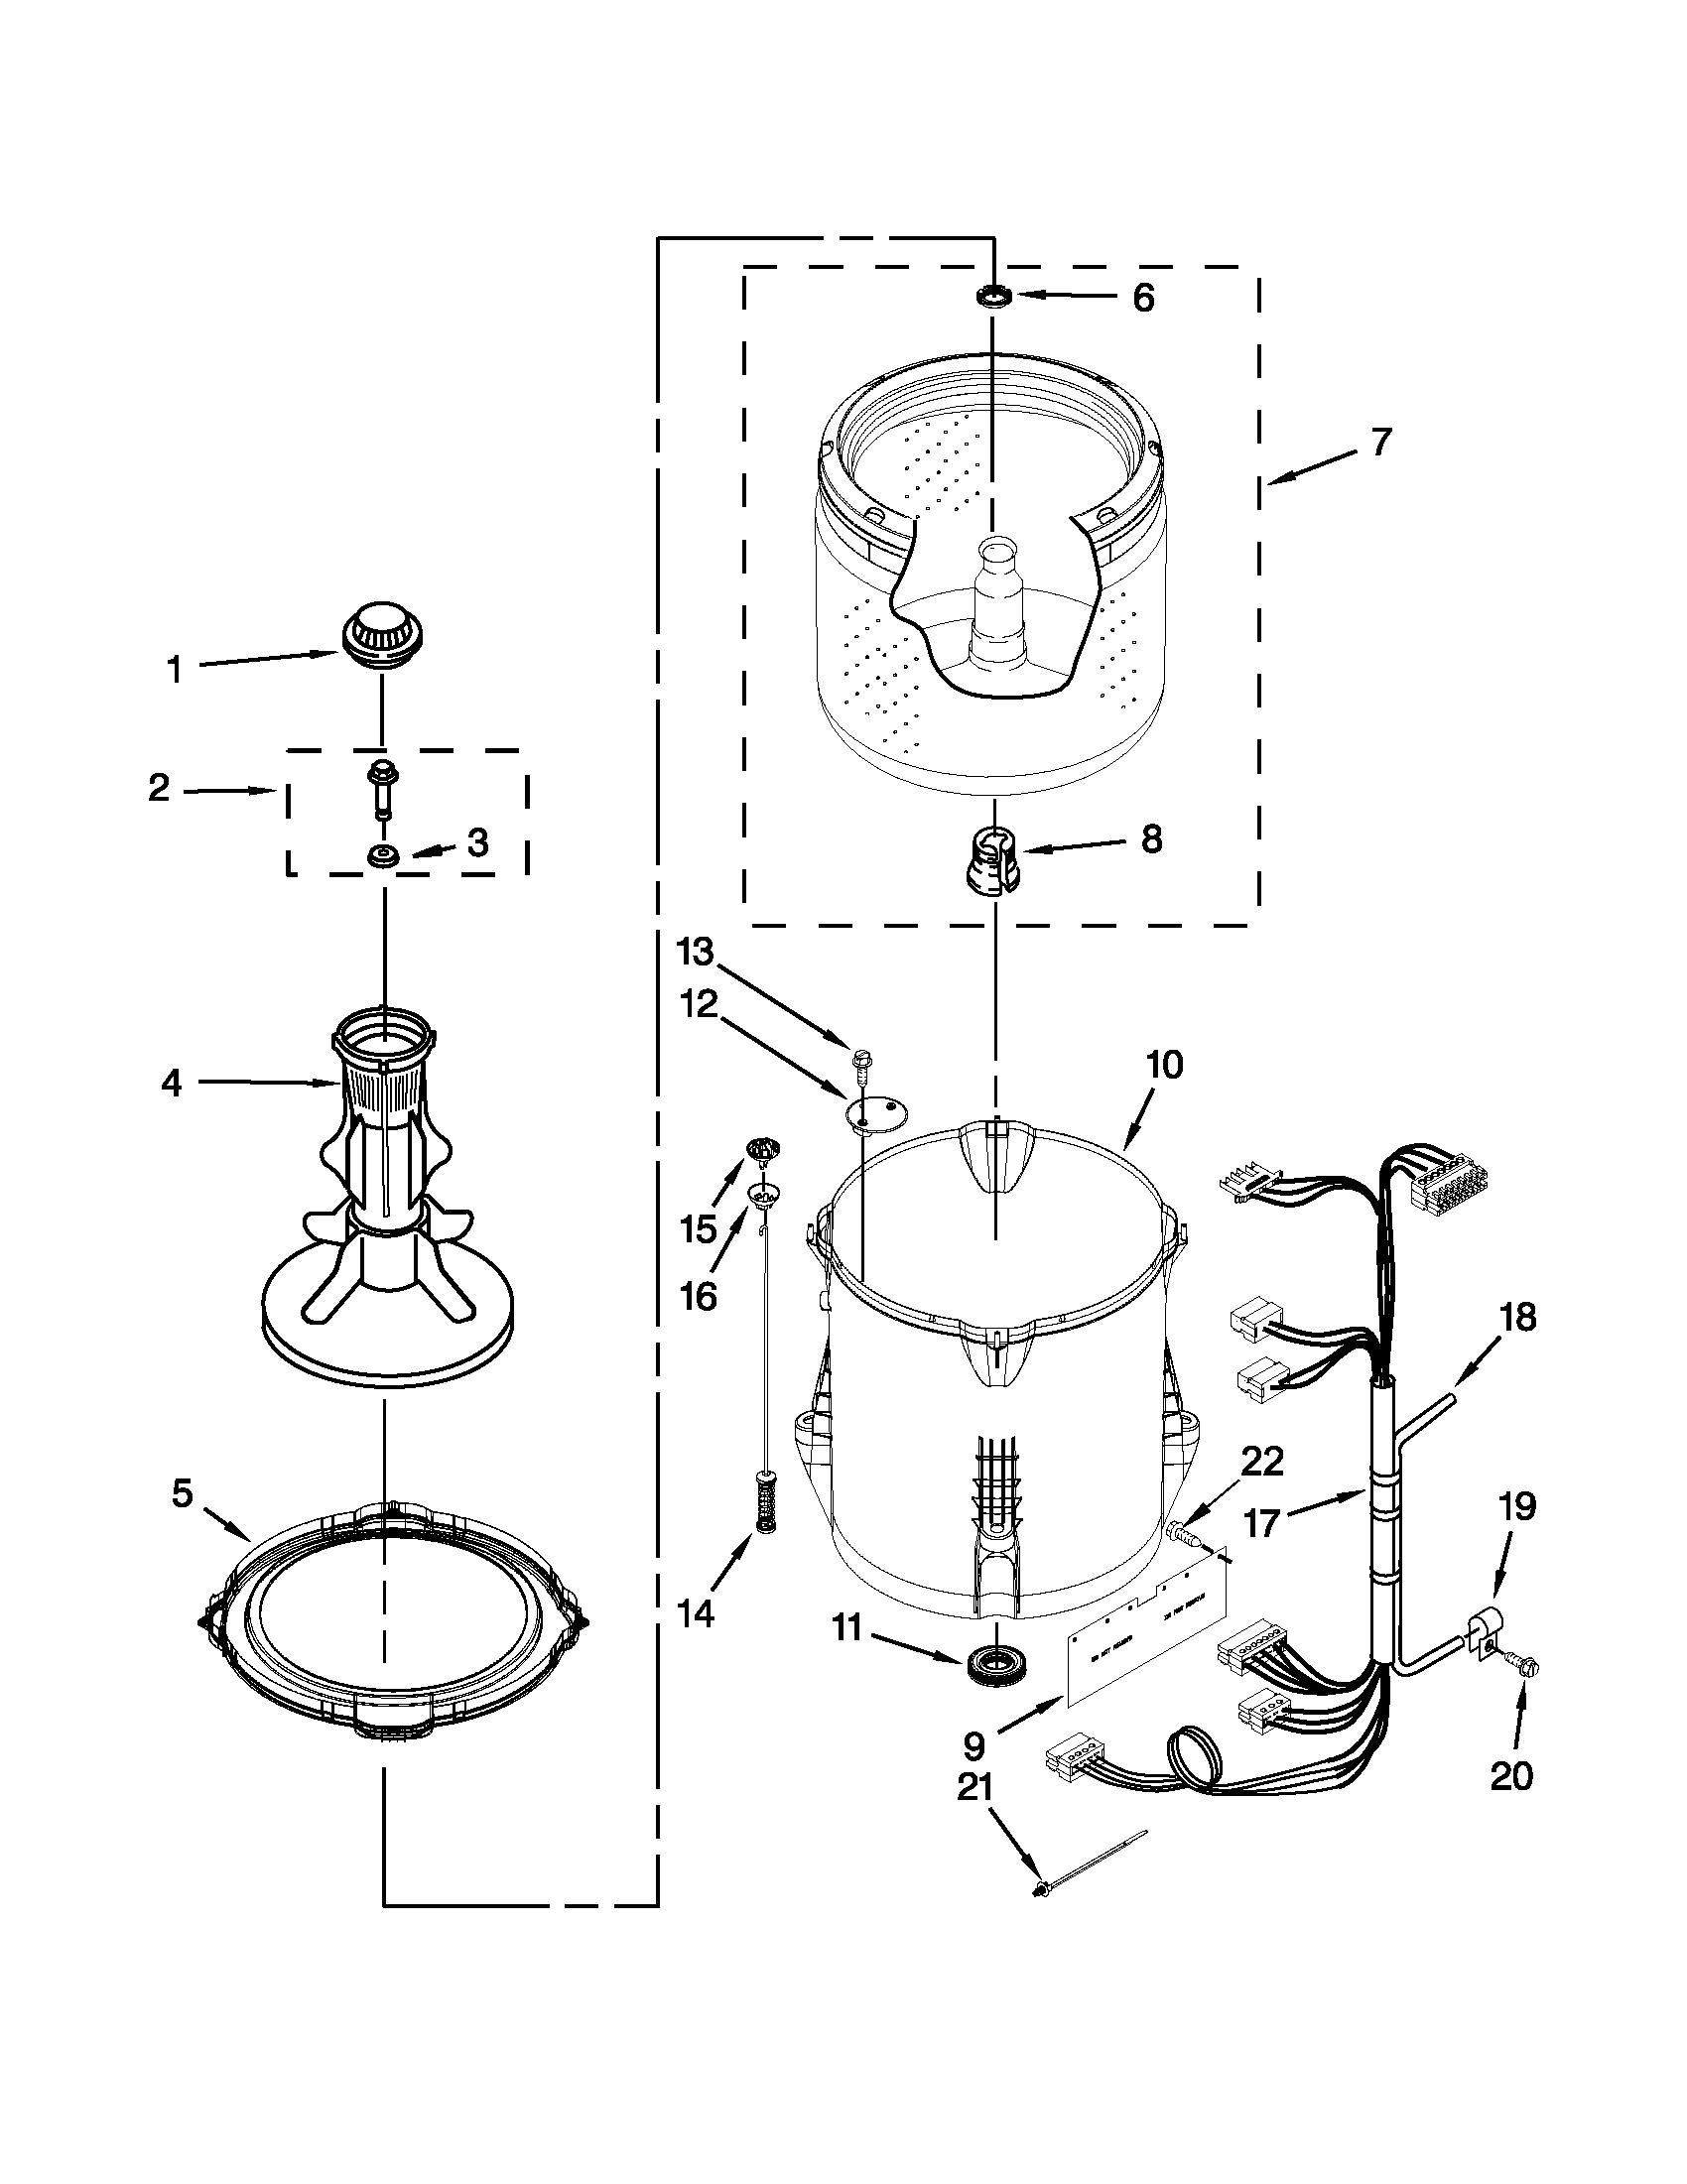 Admiral Washing Machine Wiring Diagram - Led Jeep Light Switch Wiring  Diagram - ad6e6.sehidup.jeanjaures37.fr   Admiral Washing Machine Wiring Diagram      Wiring Diagram Resource